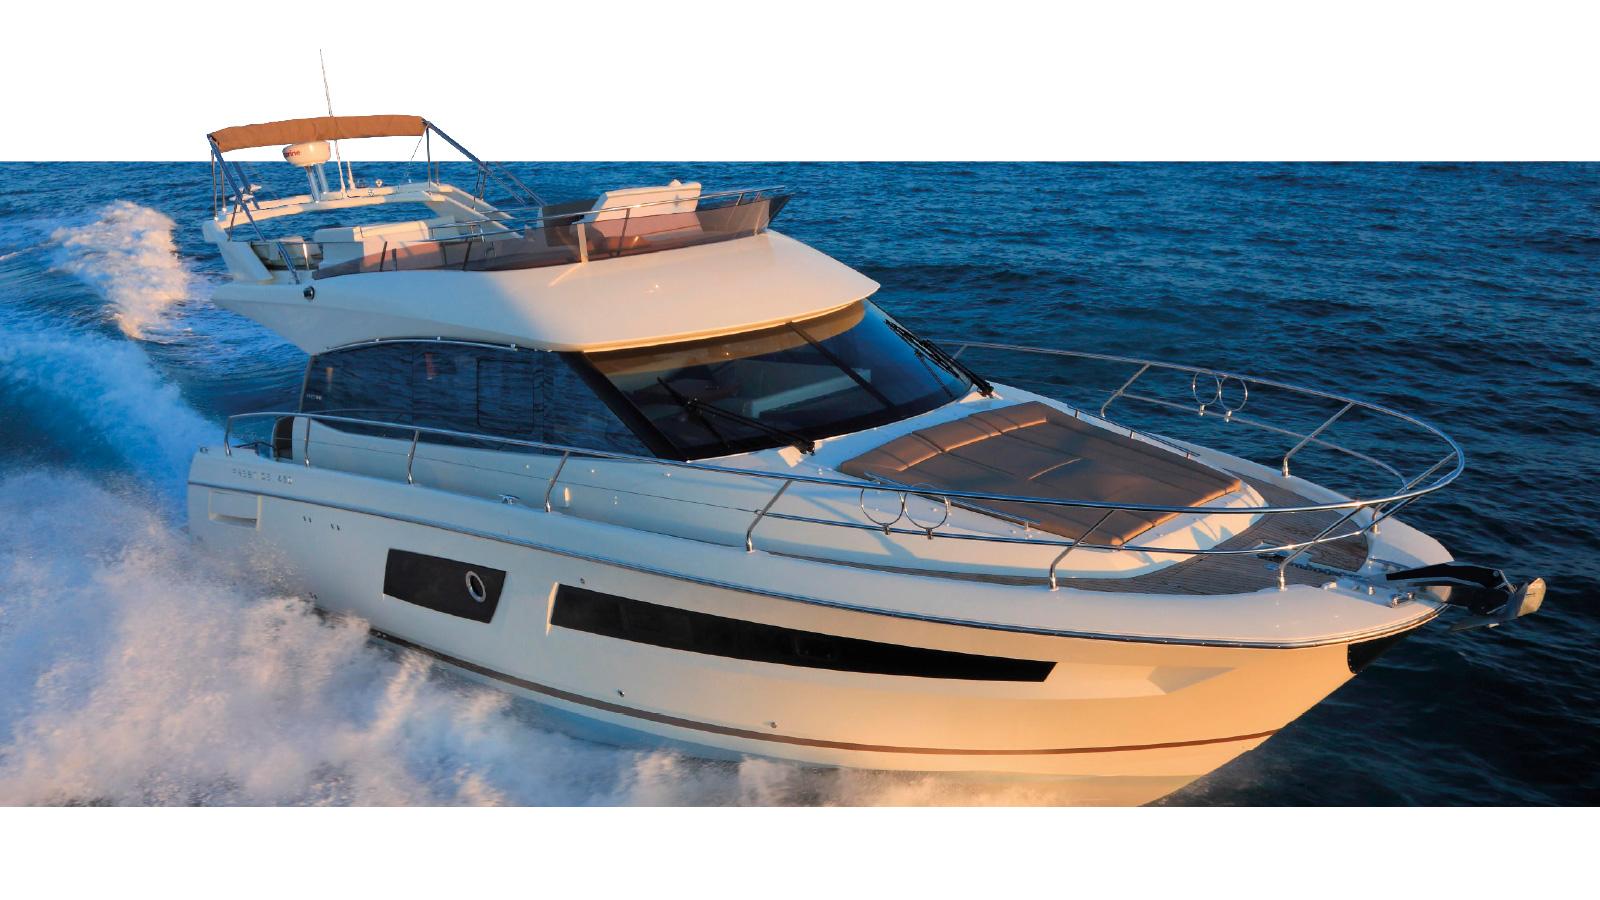 Yacht La Hune 2.0 en navigation